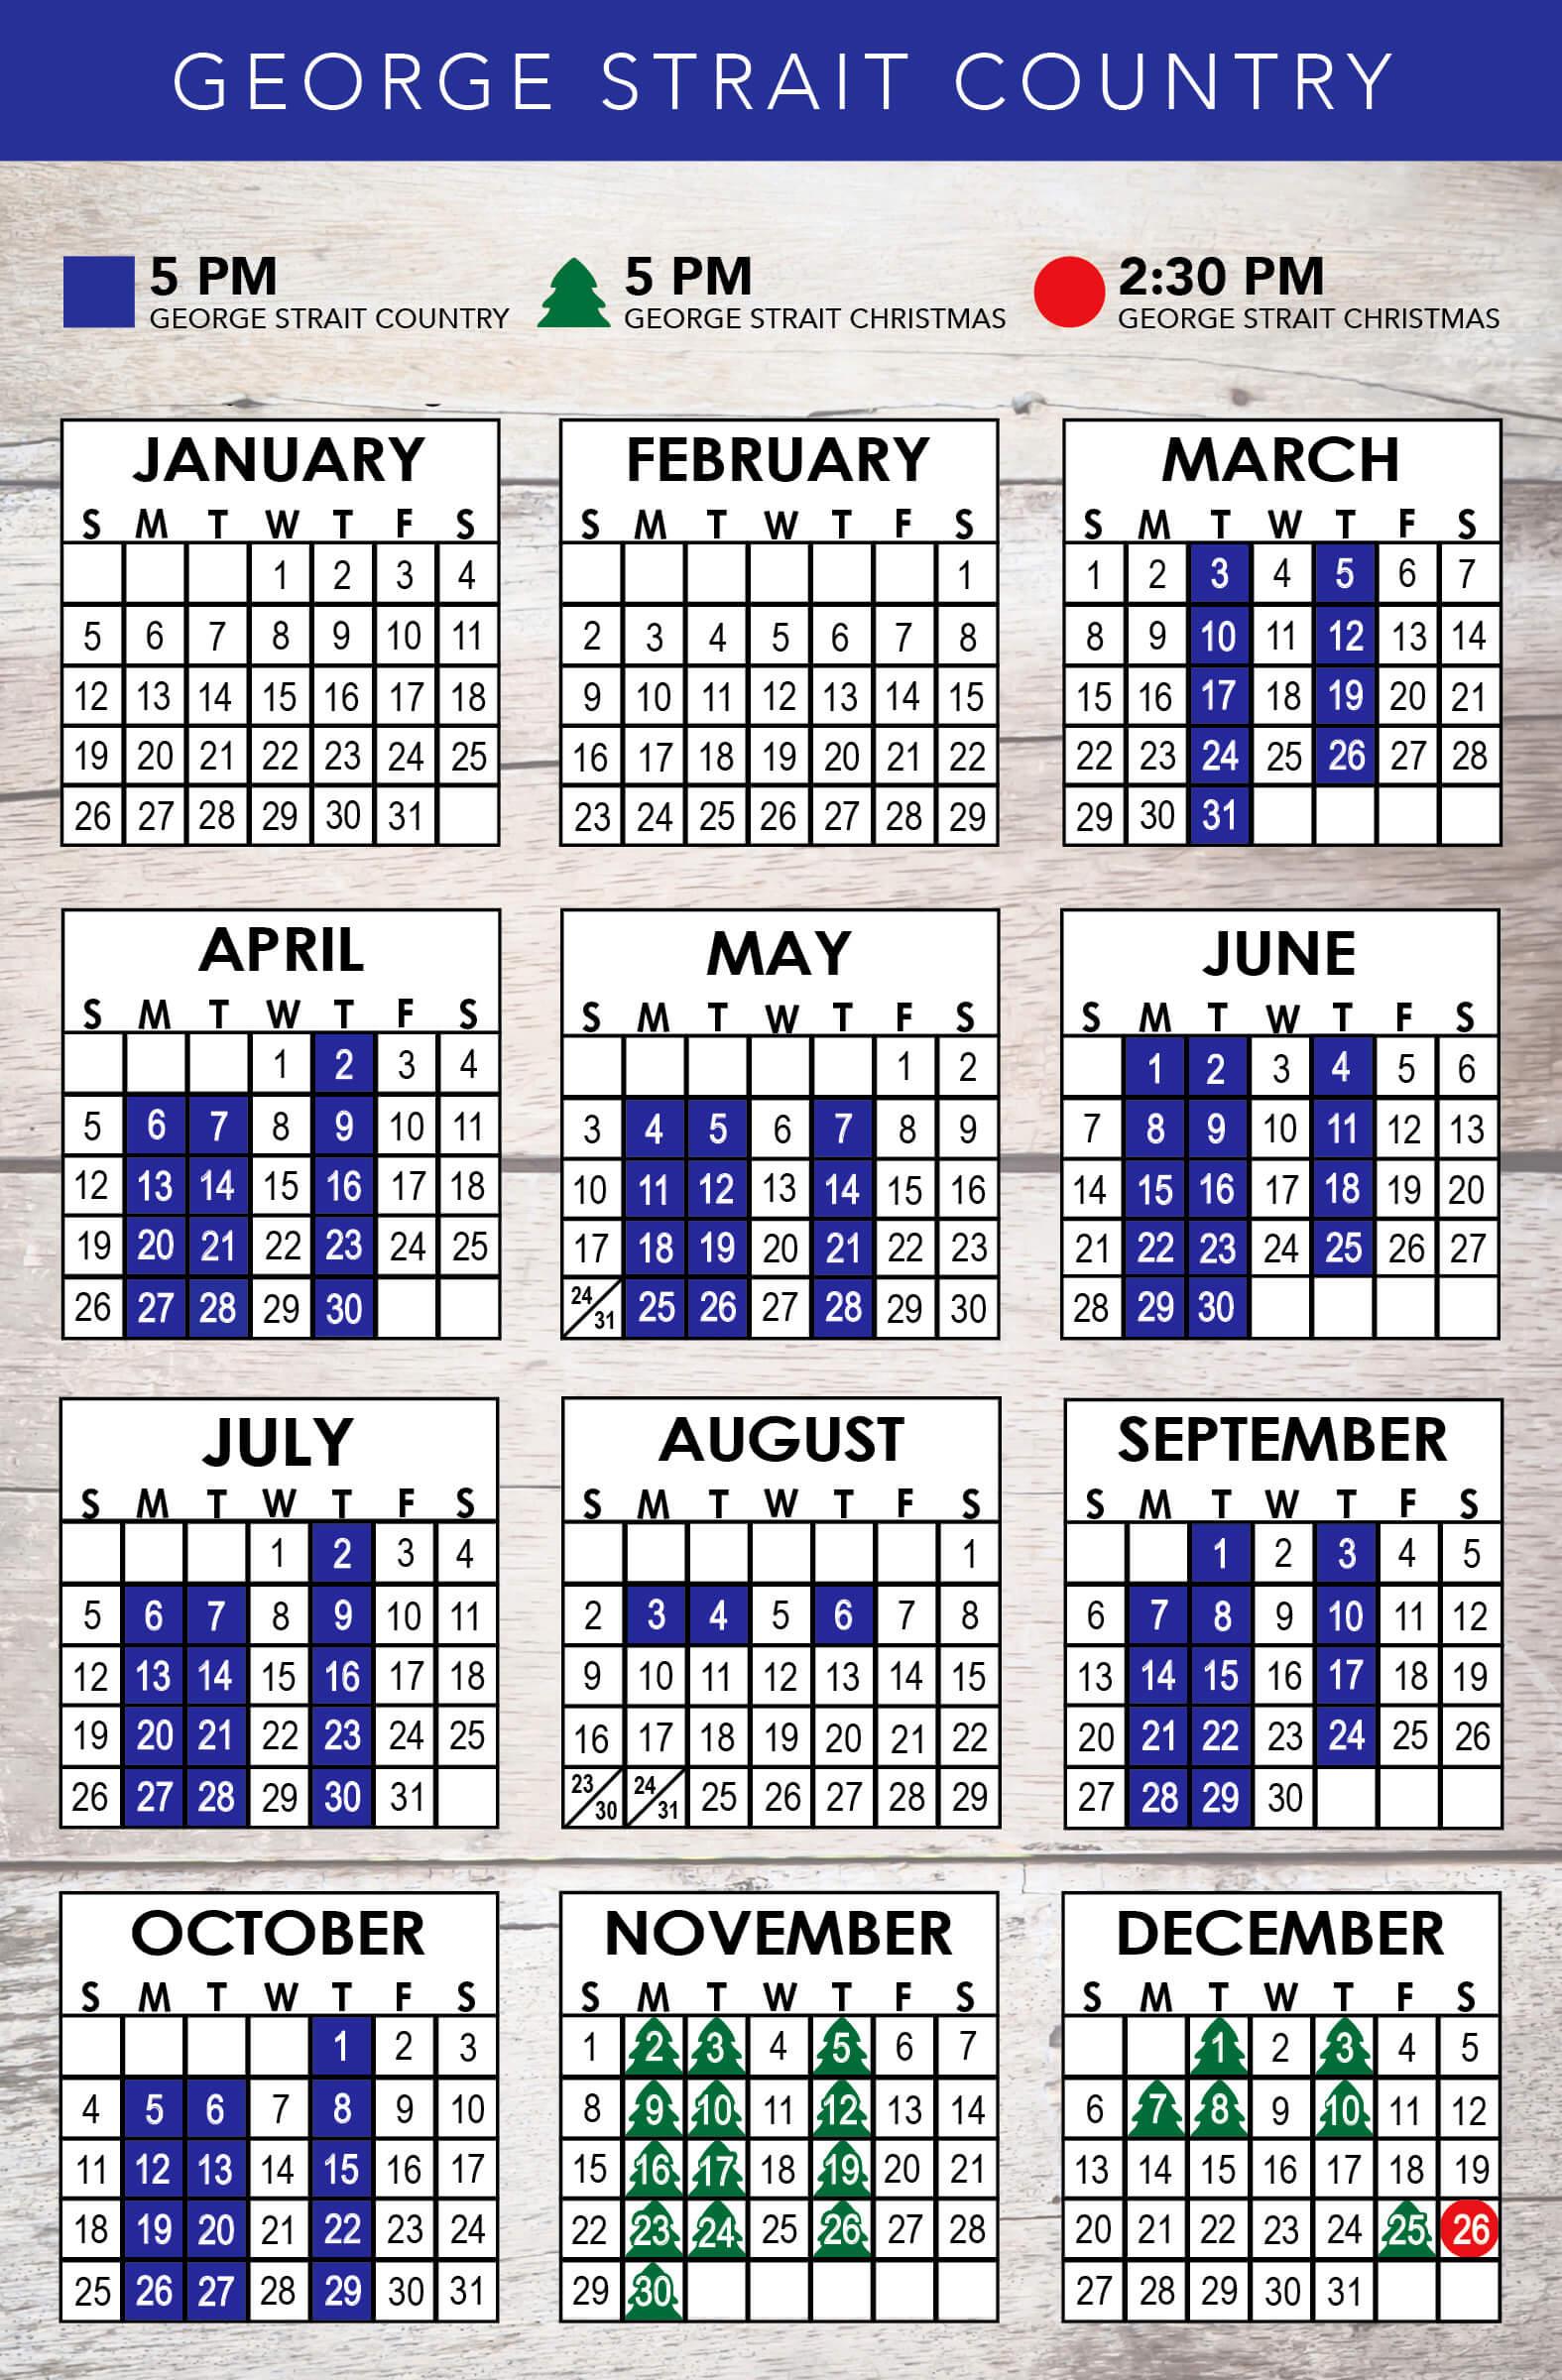 George Strait Country 2020 Schedule